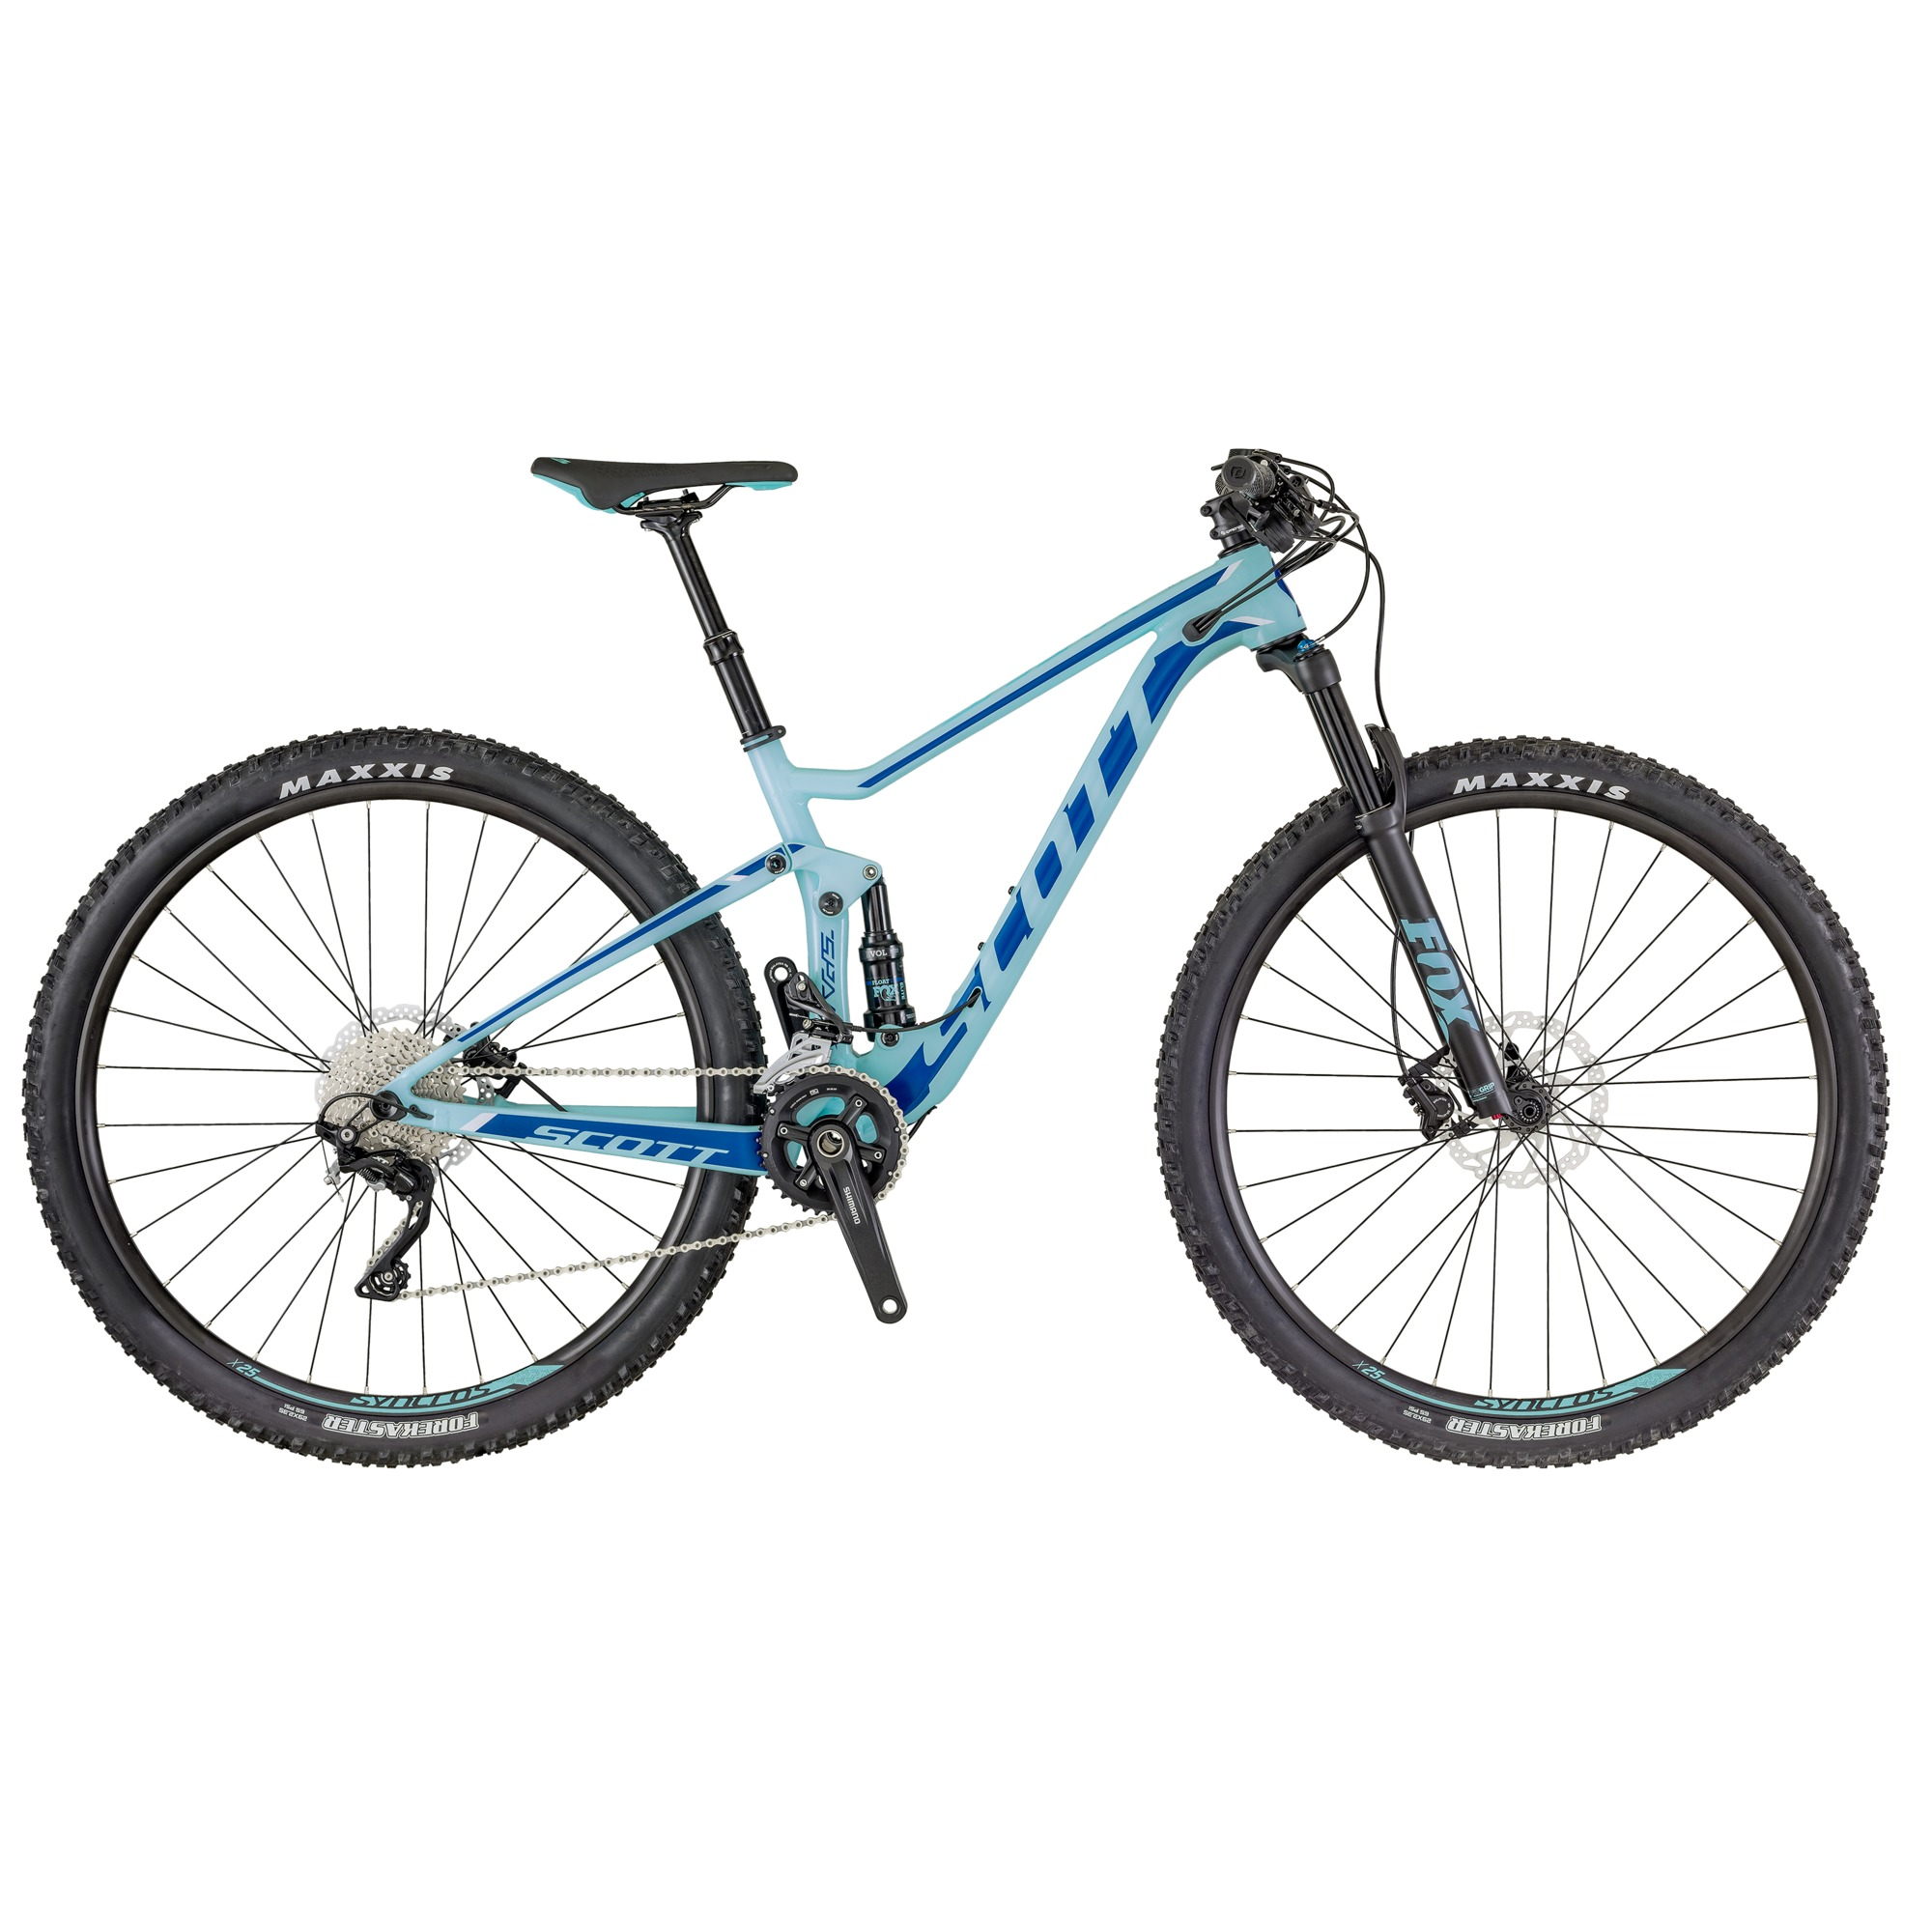 SCOTT Contessa Spark 920 Bike M - Rad & Dämpferklinik GmbH